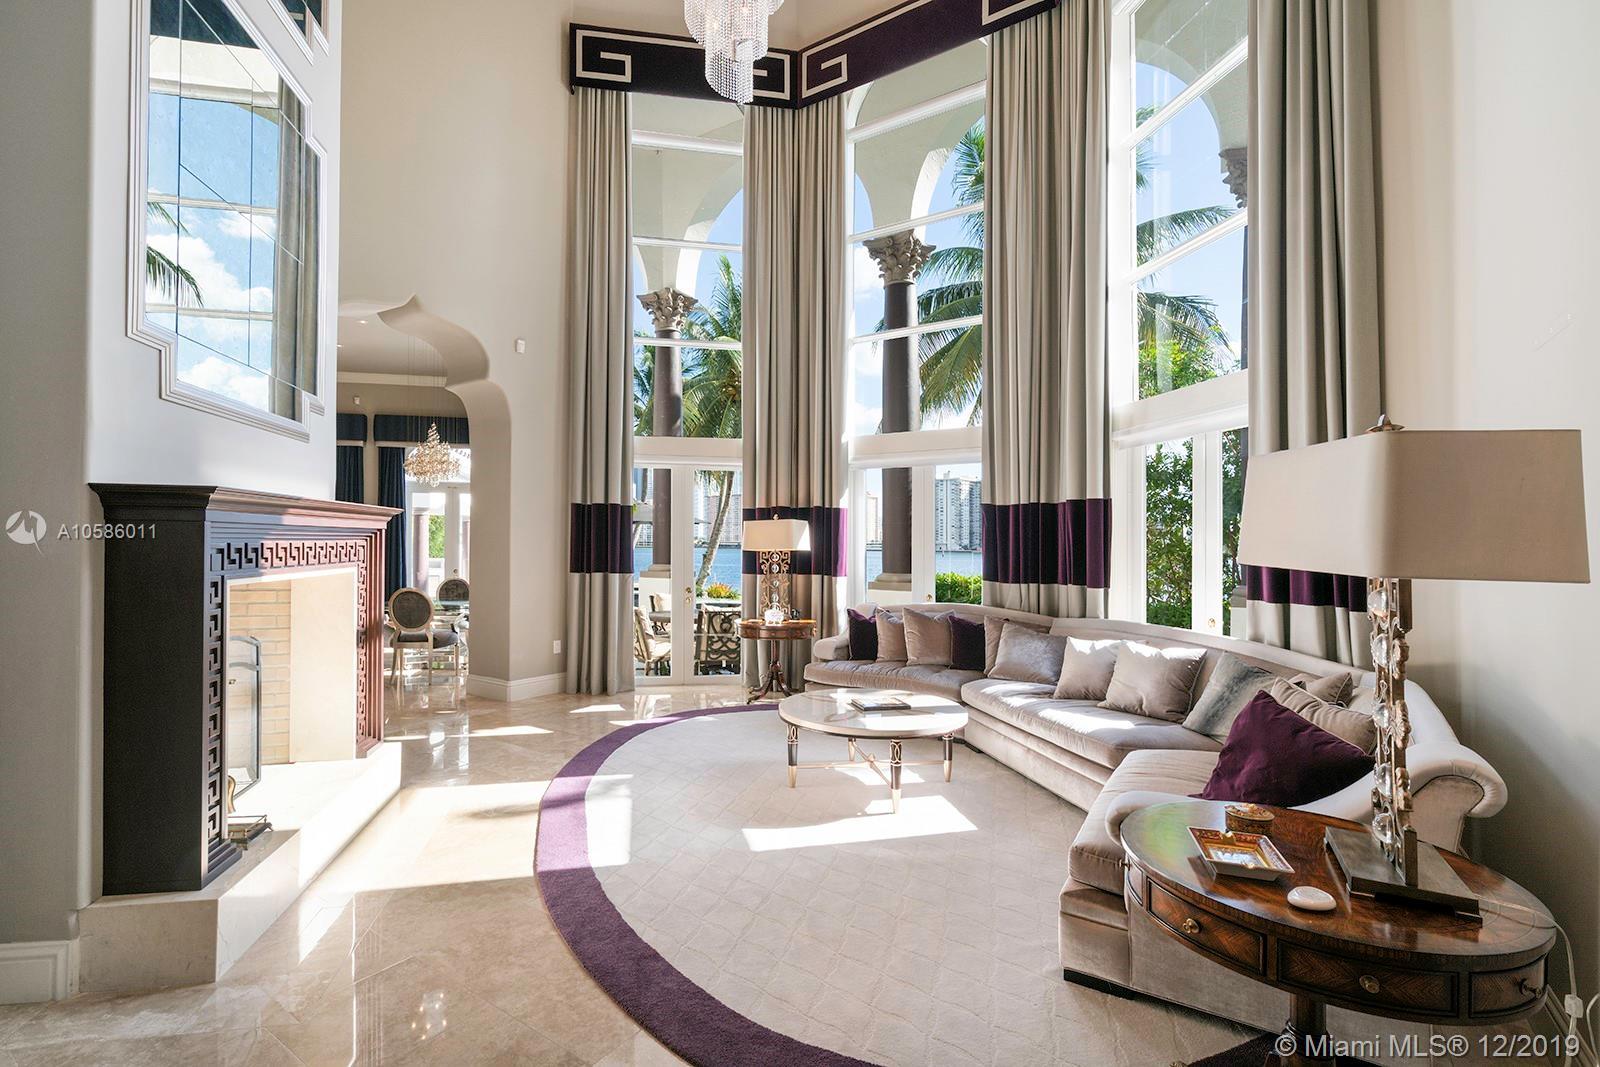 3914  Island Estates Dr  For Sale A10586011, FL